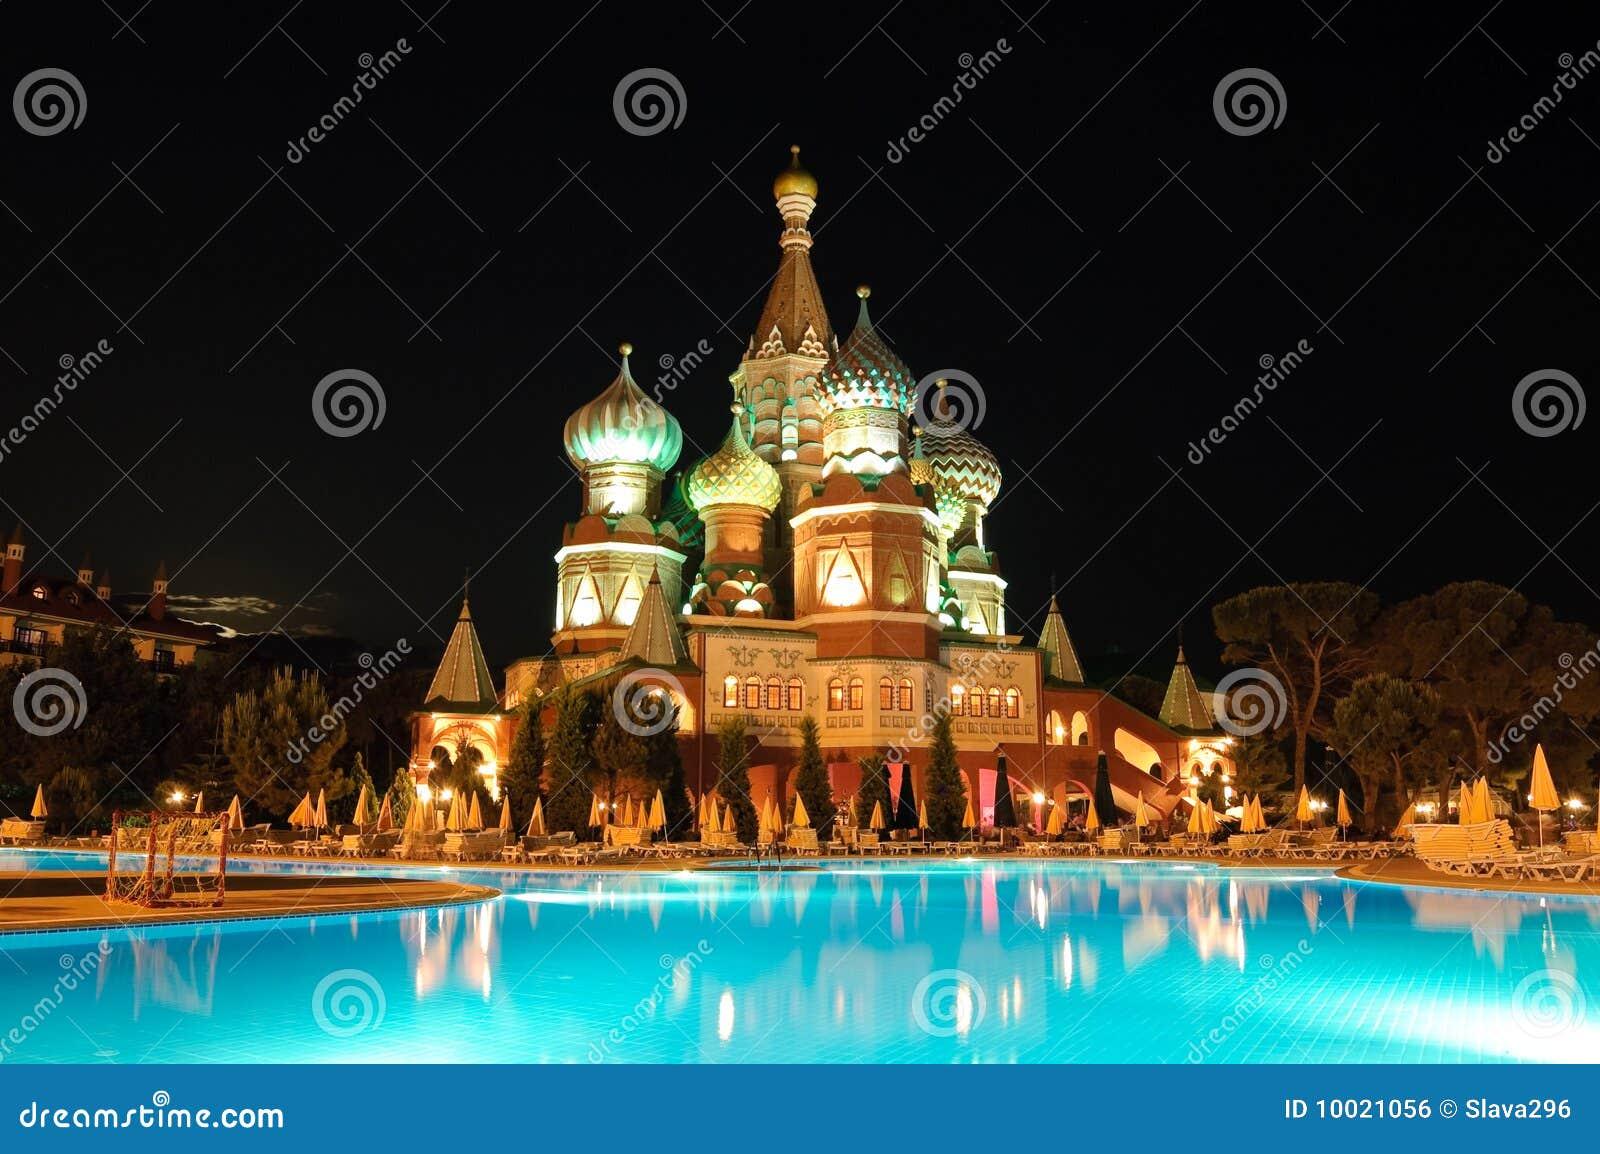 Kremlin style hotel antalya turkey stock photo image for Style hotel